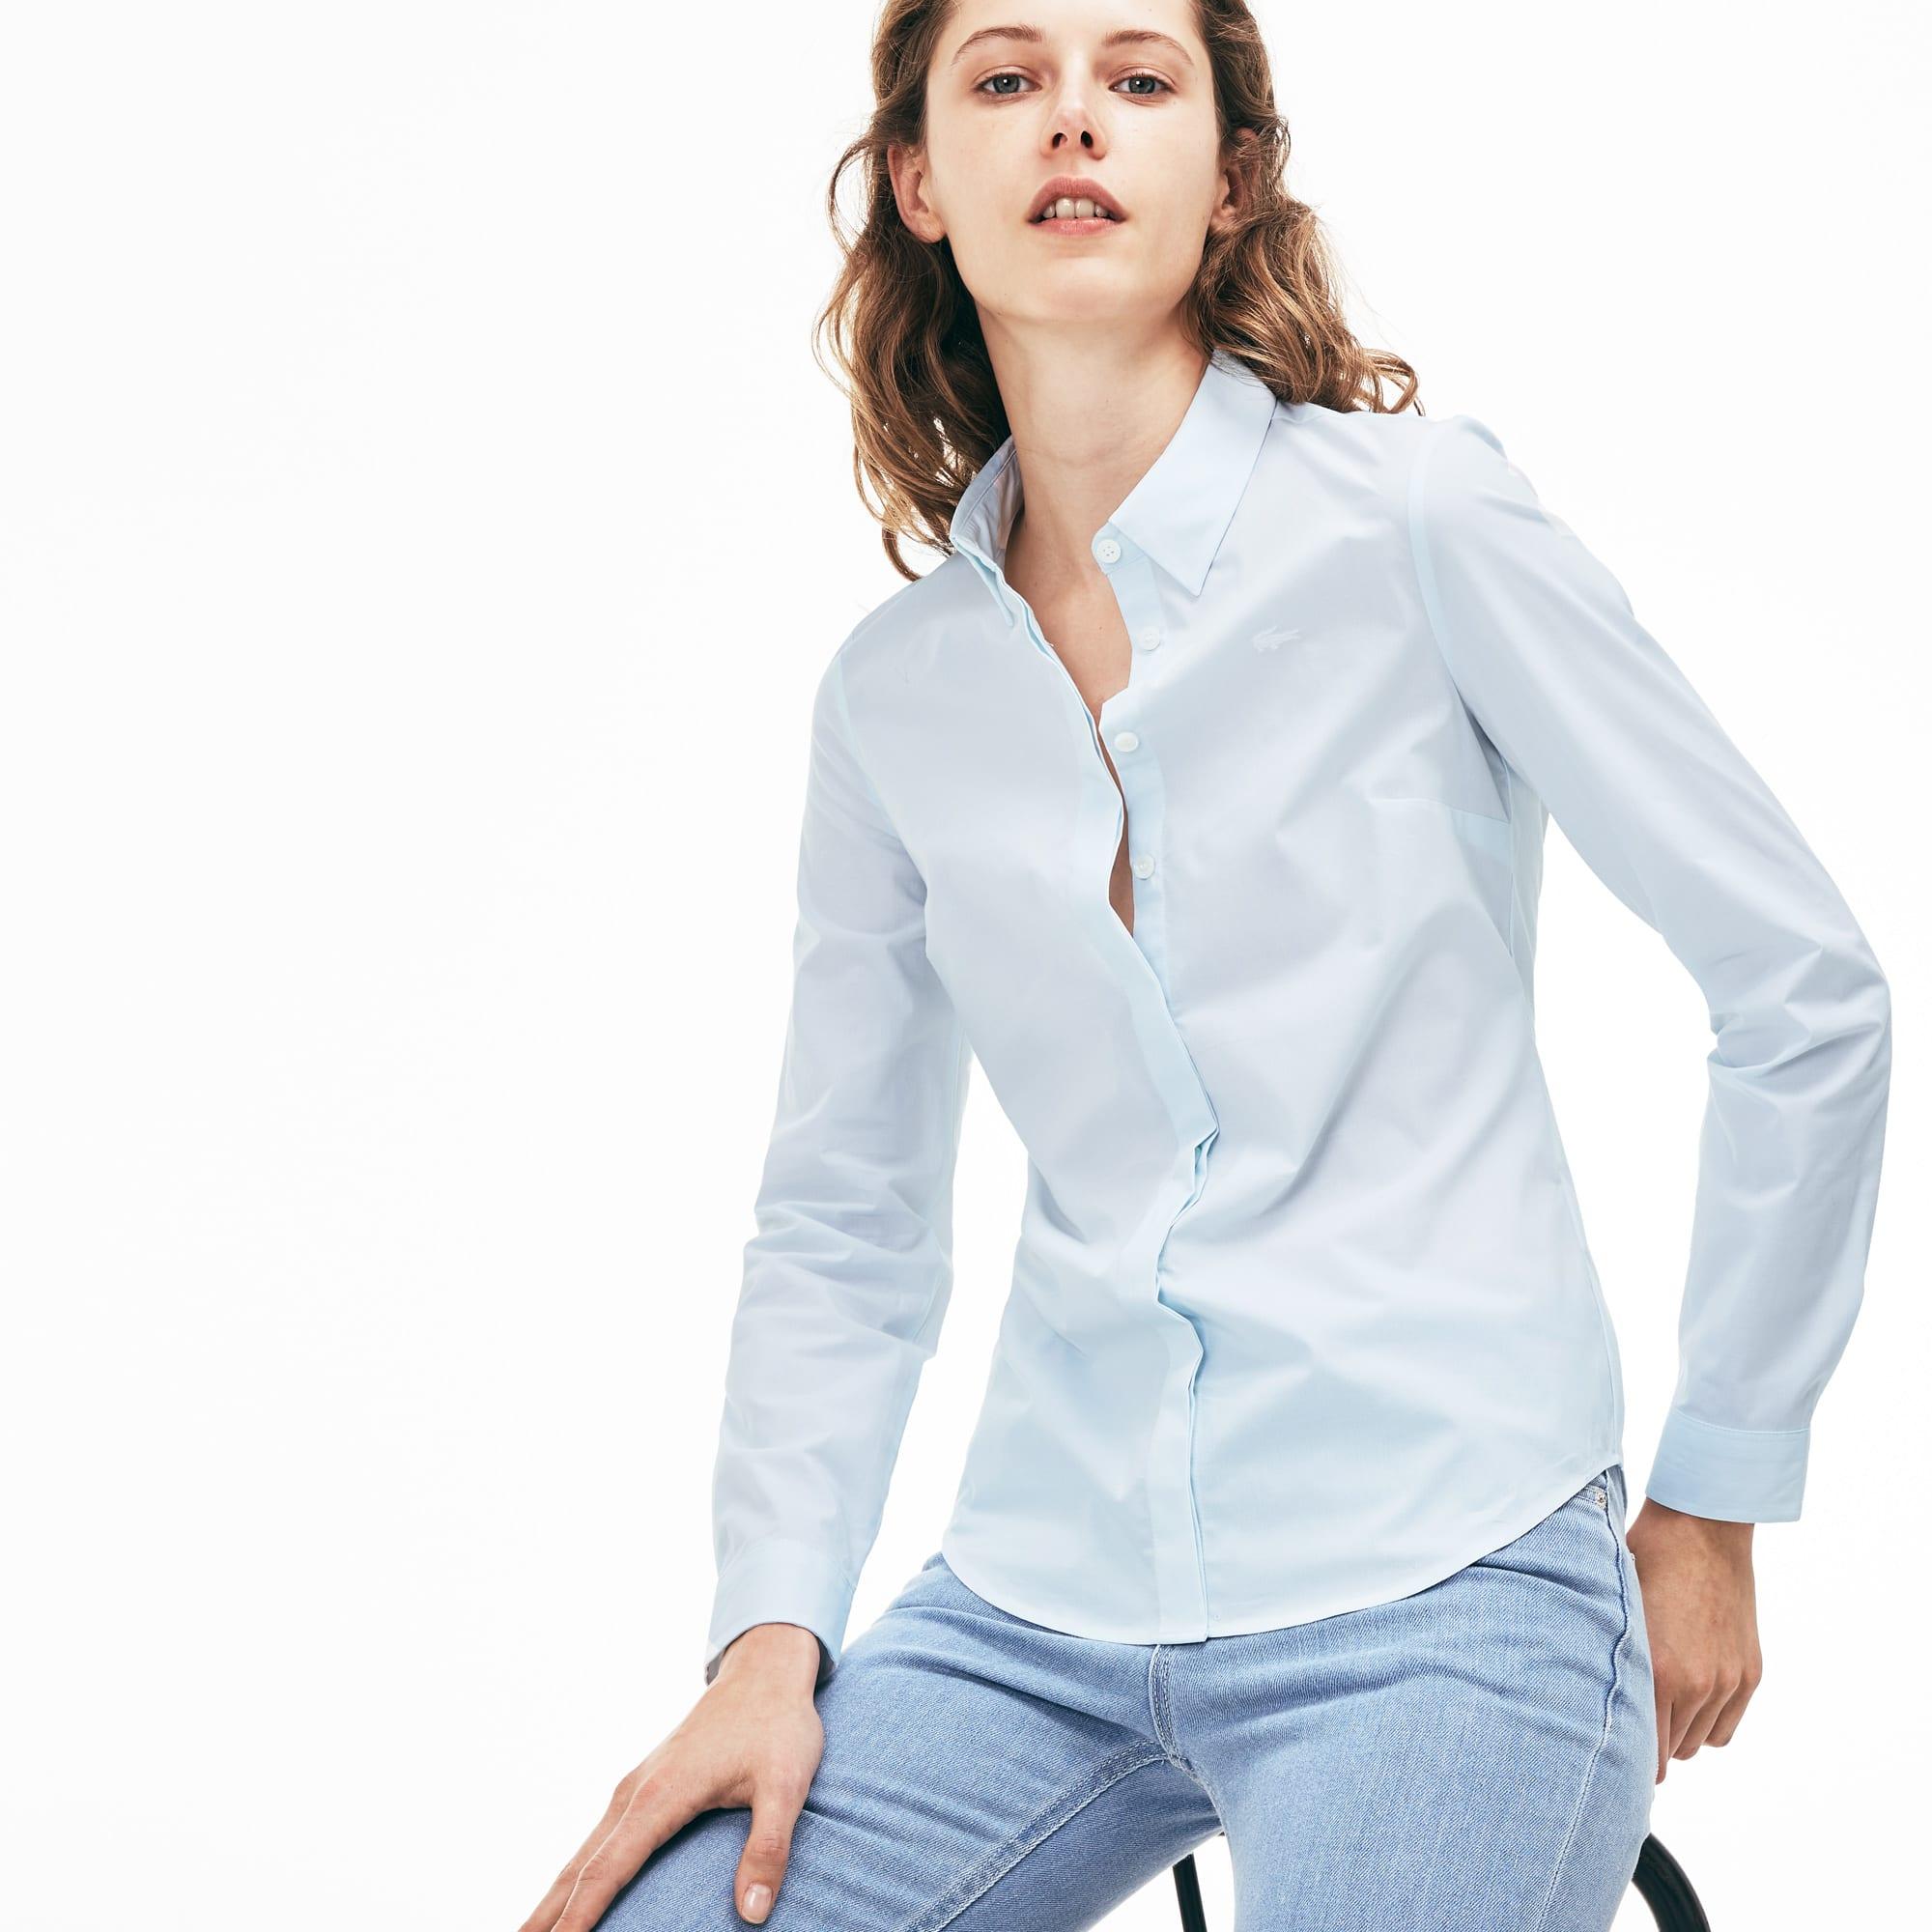 Women's Slim Fit Striped Stretch Cotton Poplin Shirt